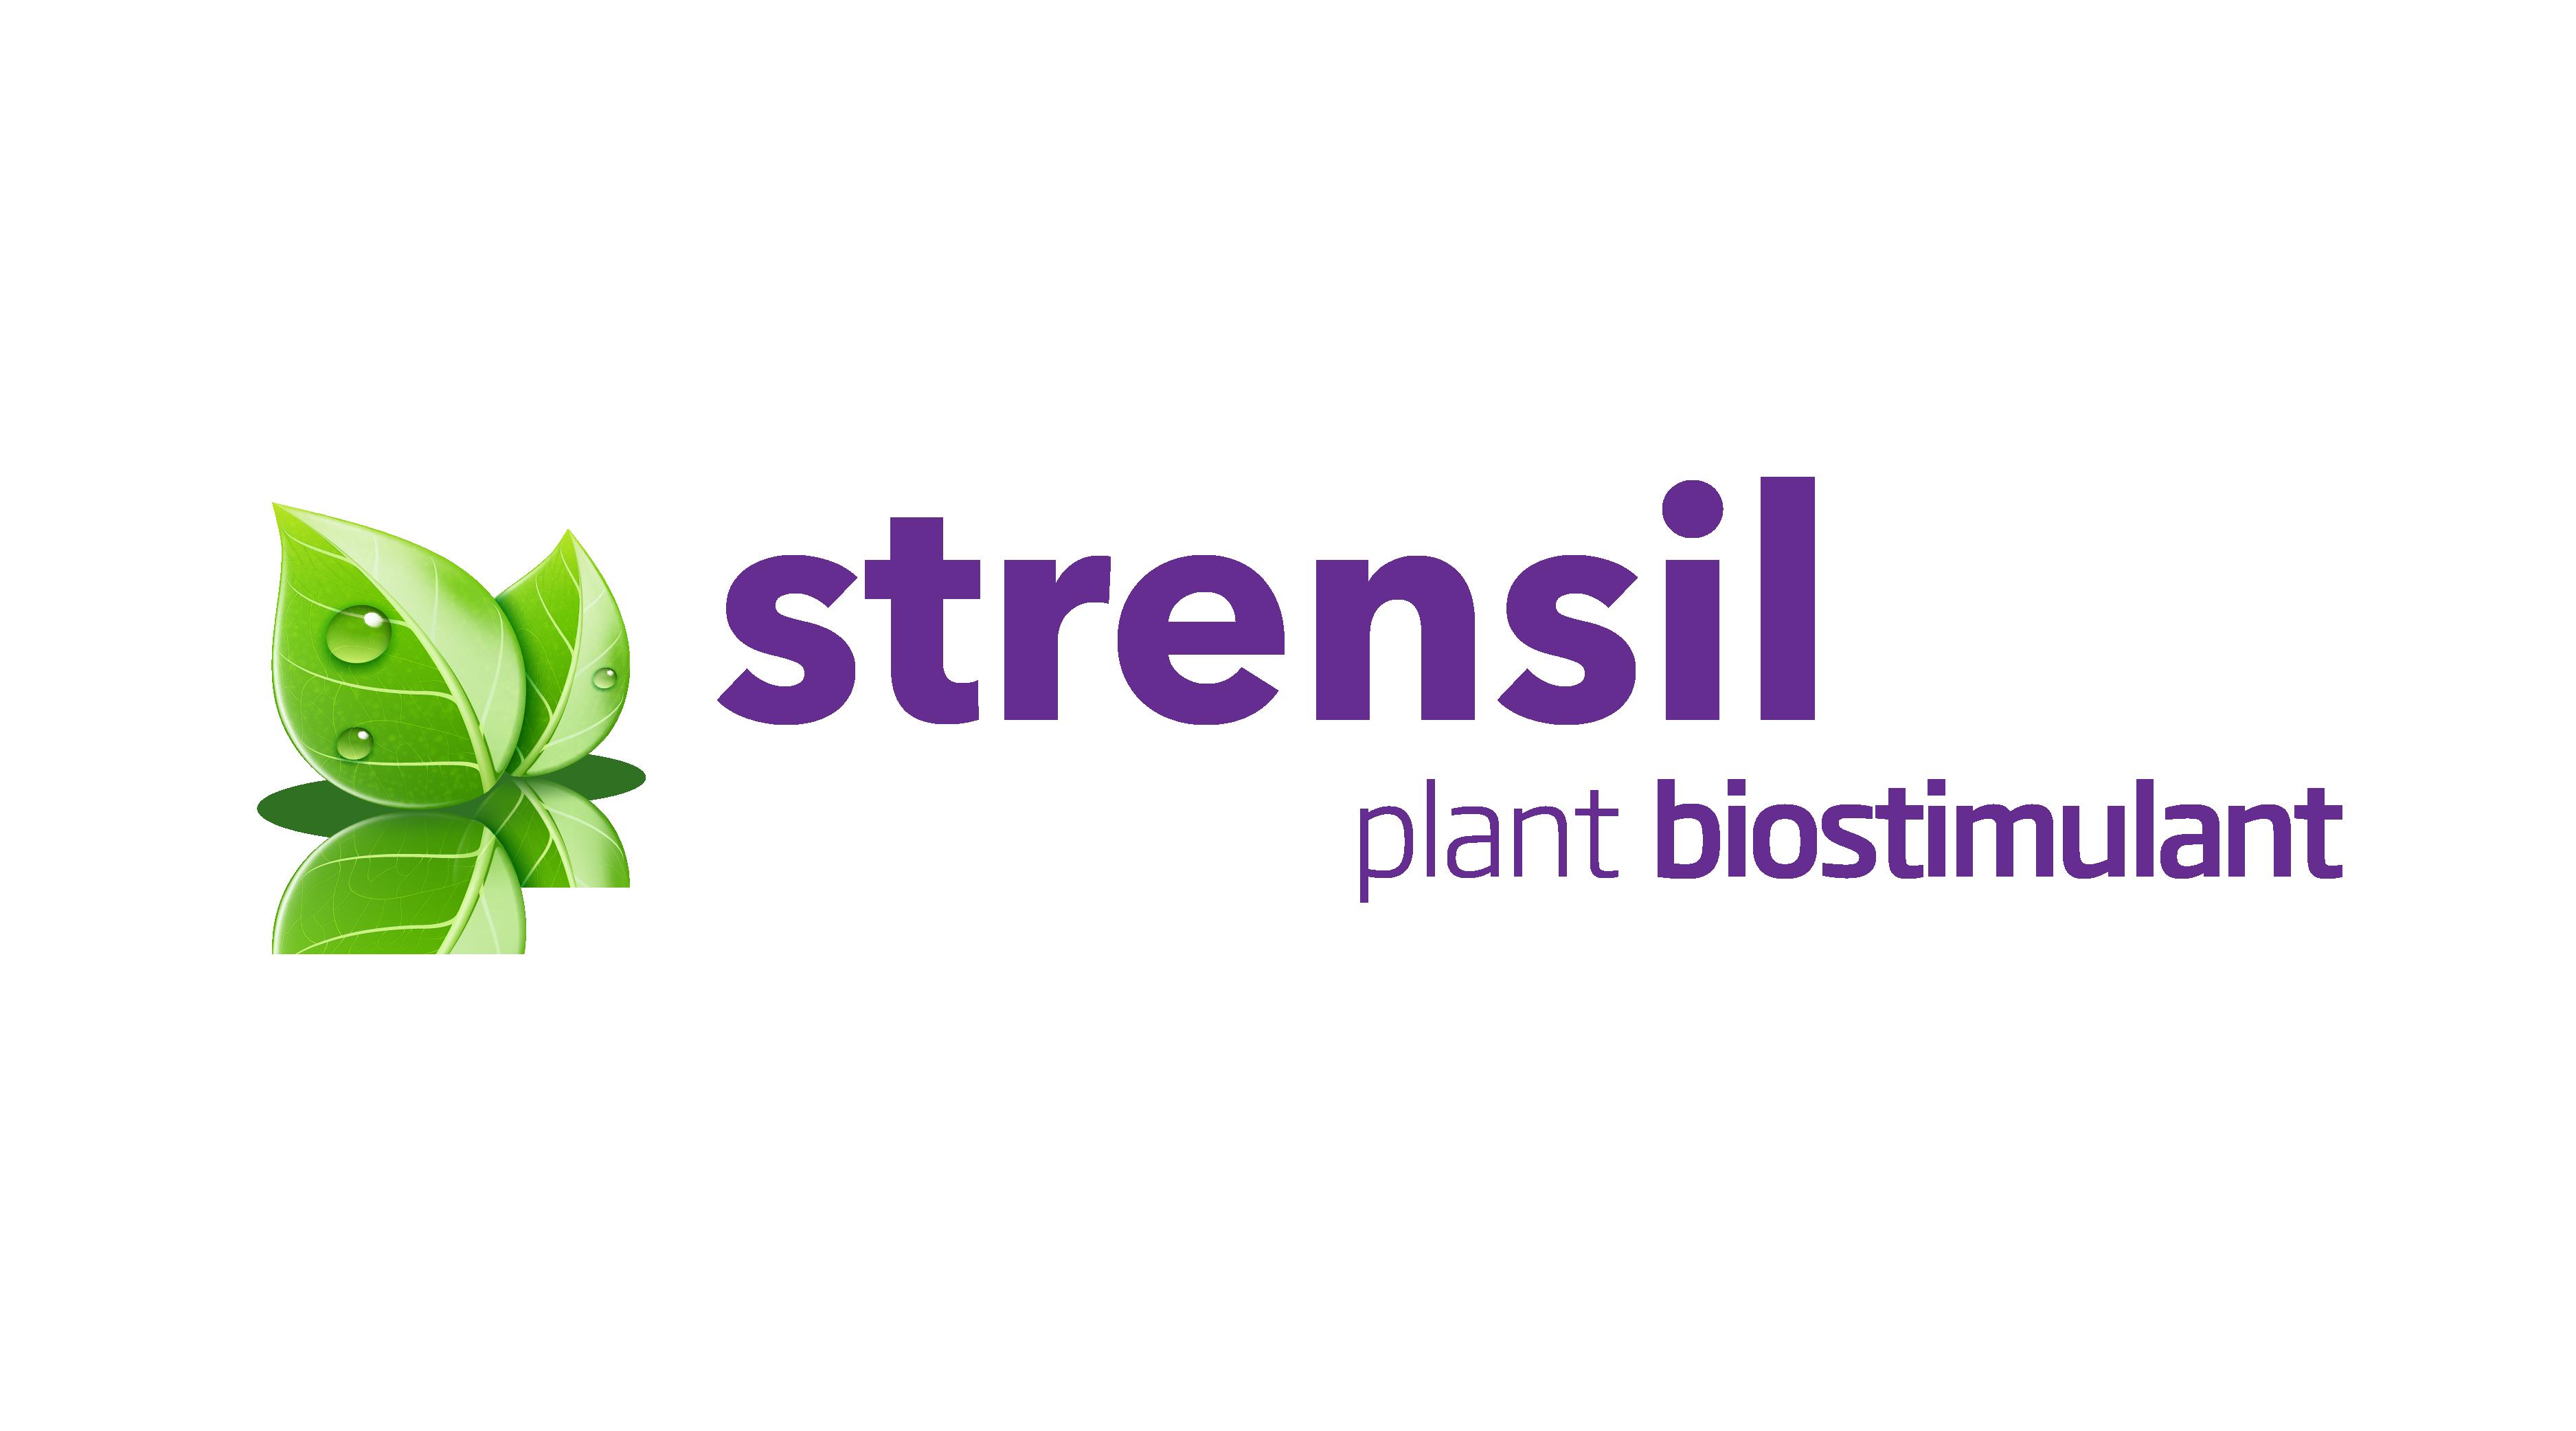 Presentamos strensil, nuestro último plant biostimulant